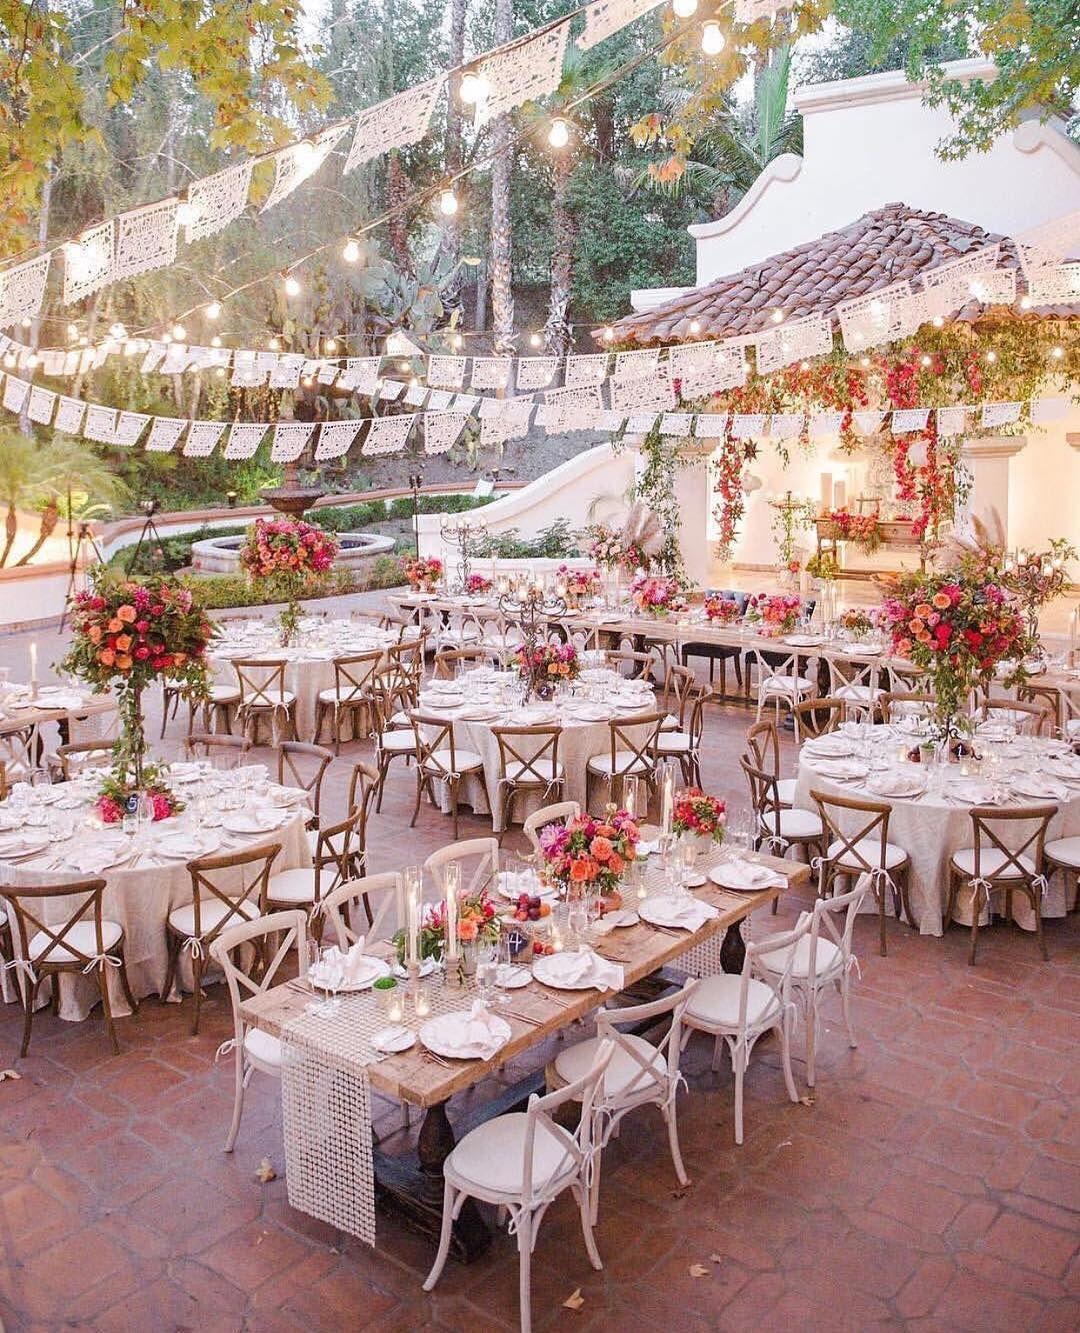 Make your courtyard wedding this pretty cena pinterest boda de cumpleaos altavistaventures Image collections